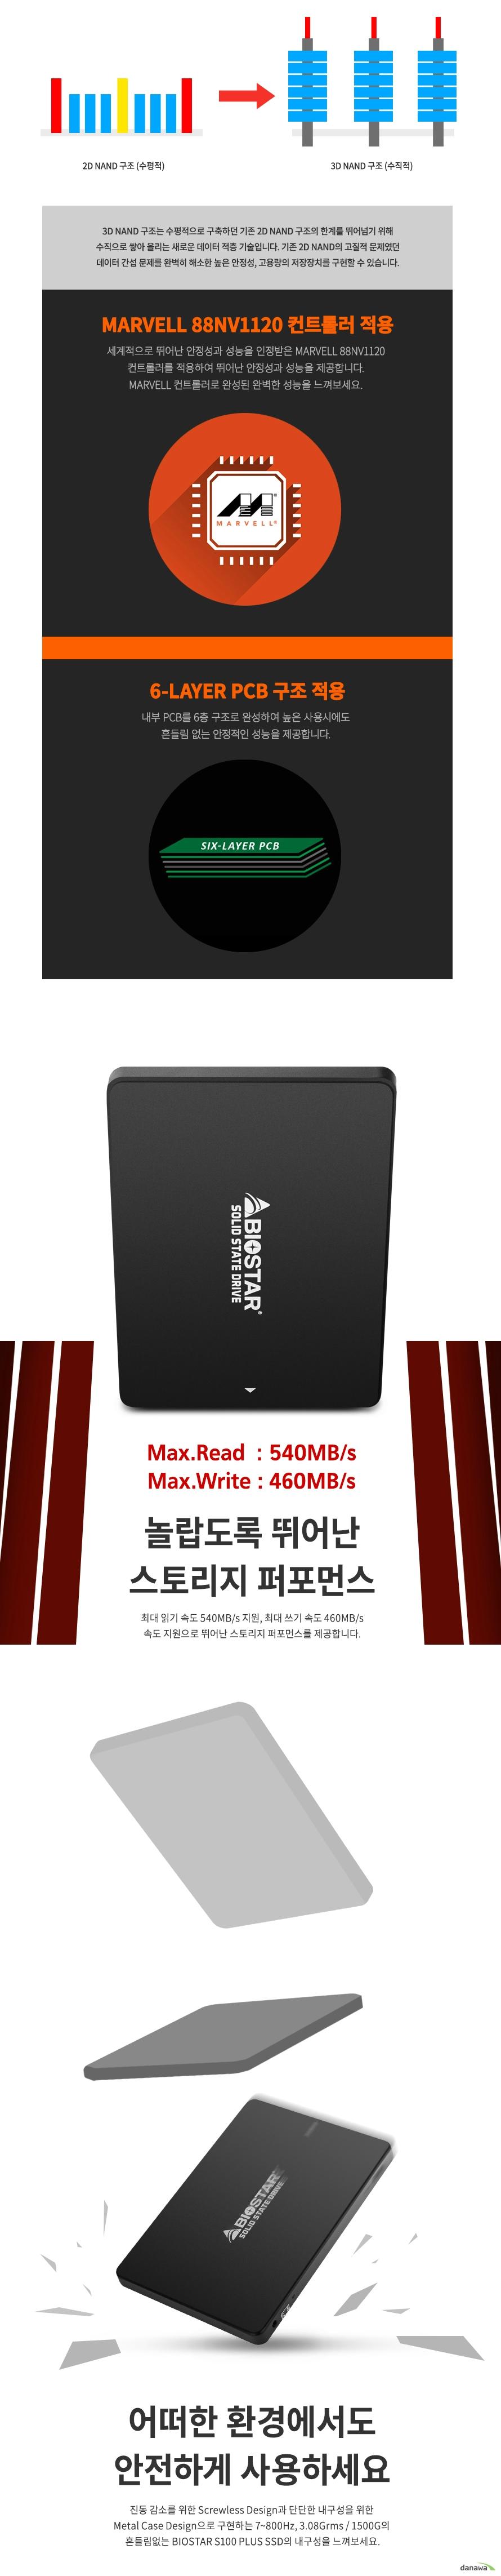 BIOSTAR  S100 PLUS(480GB)